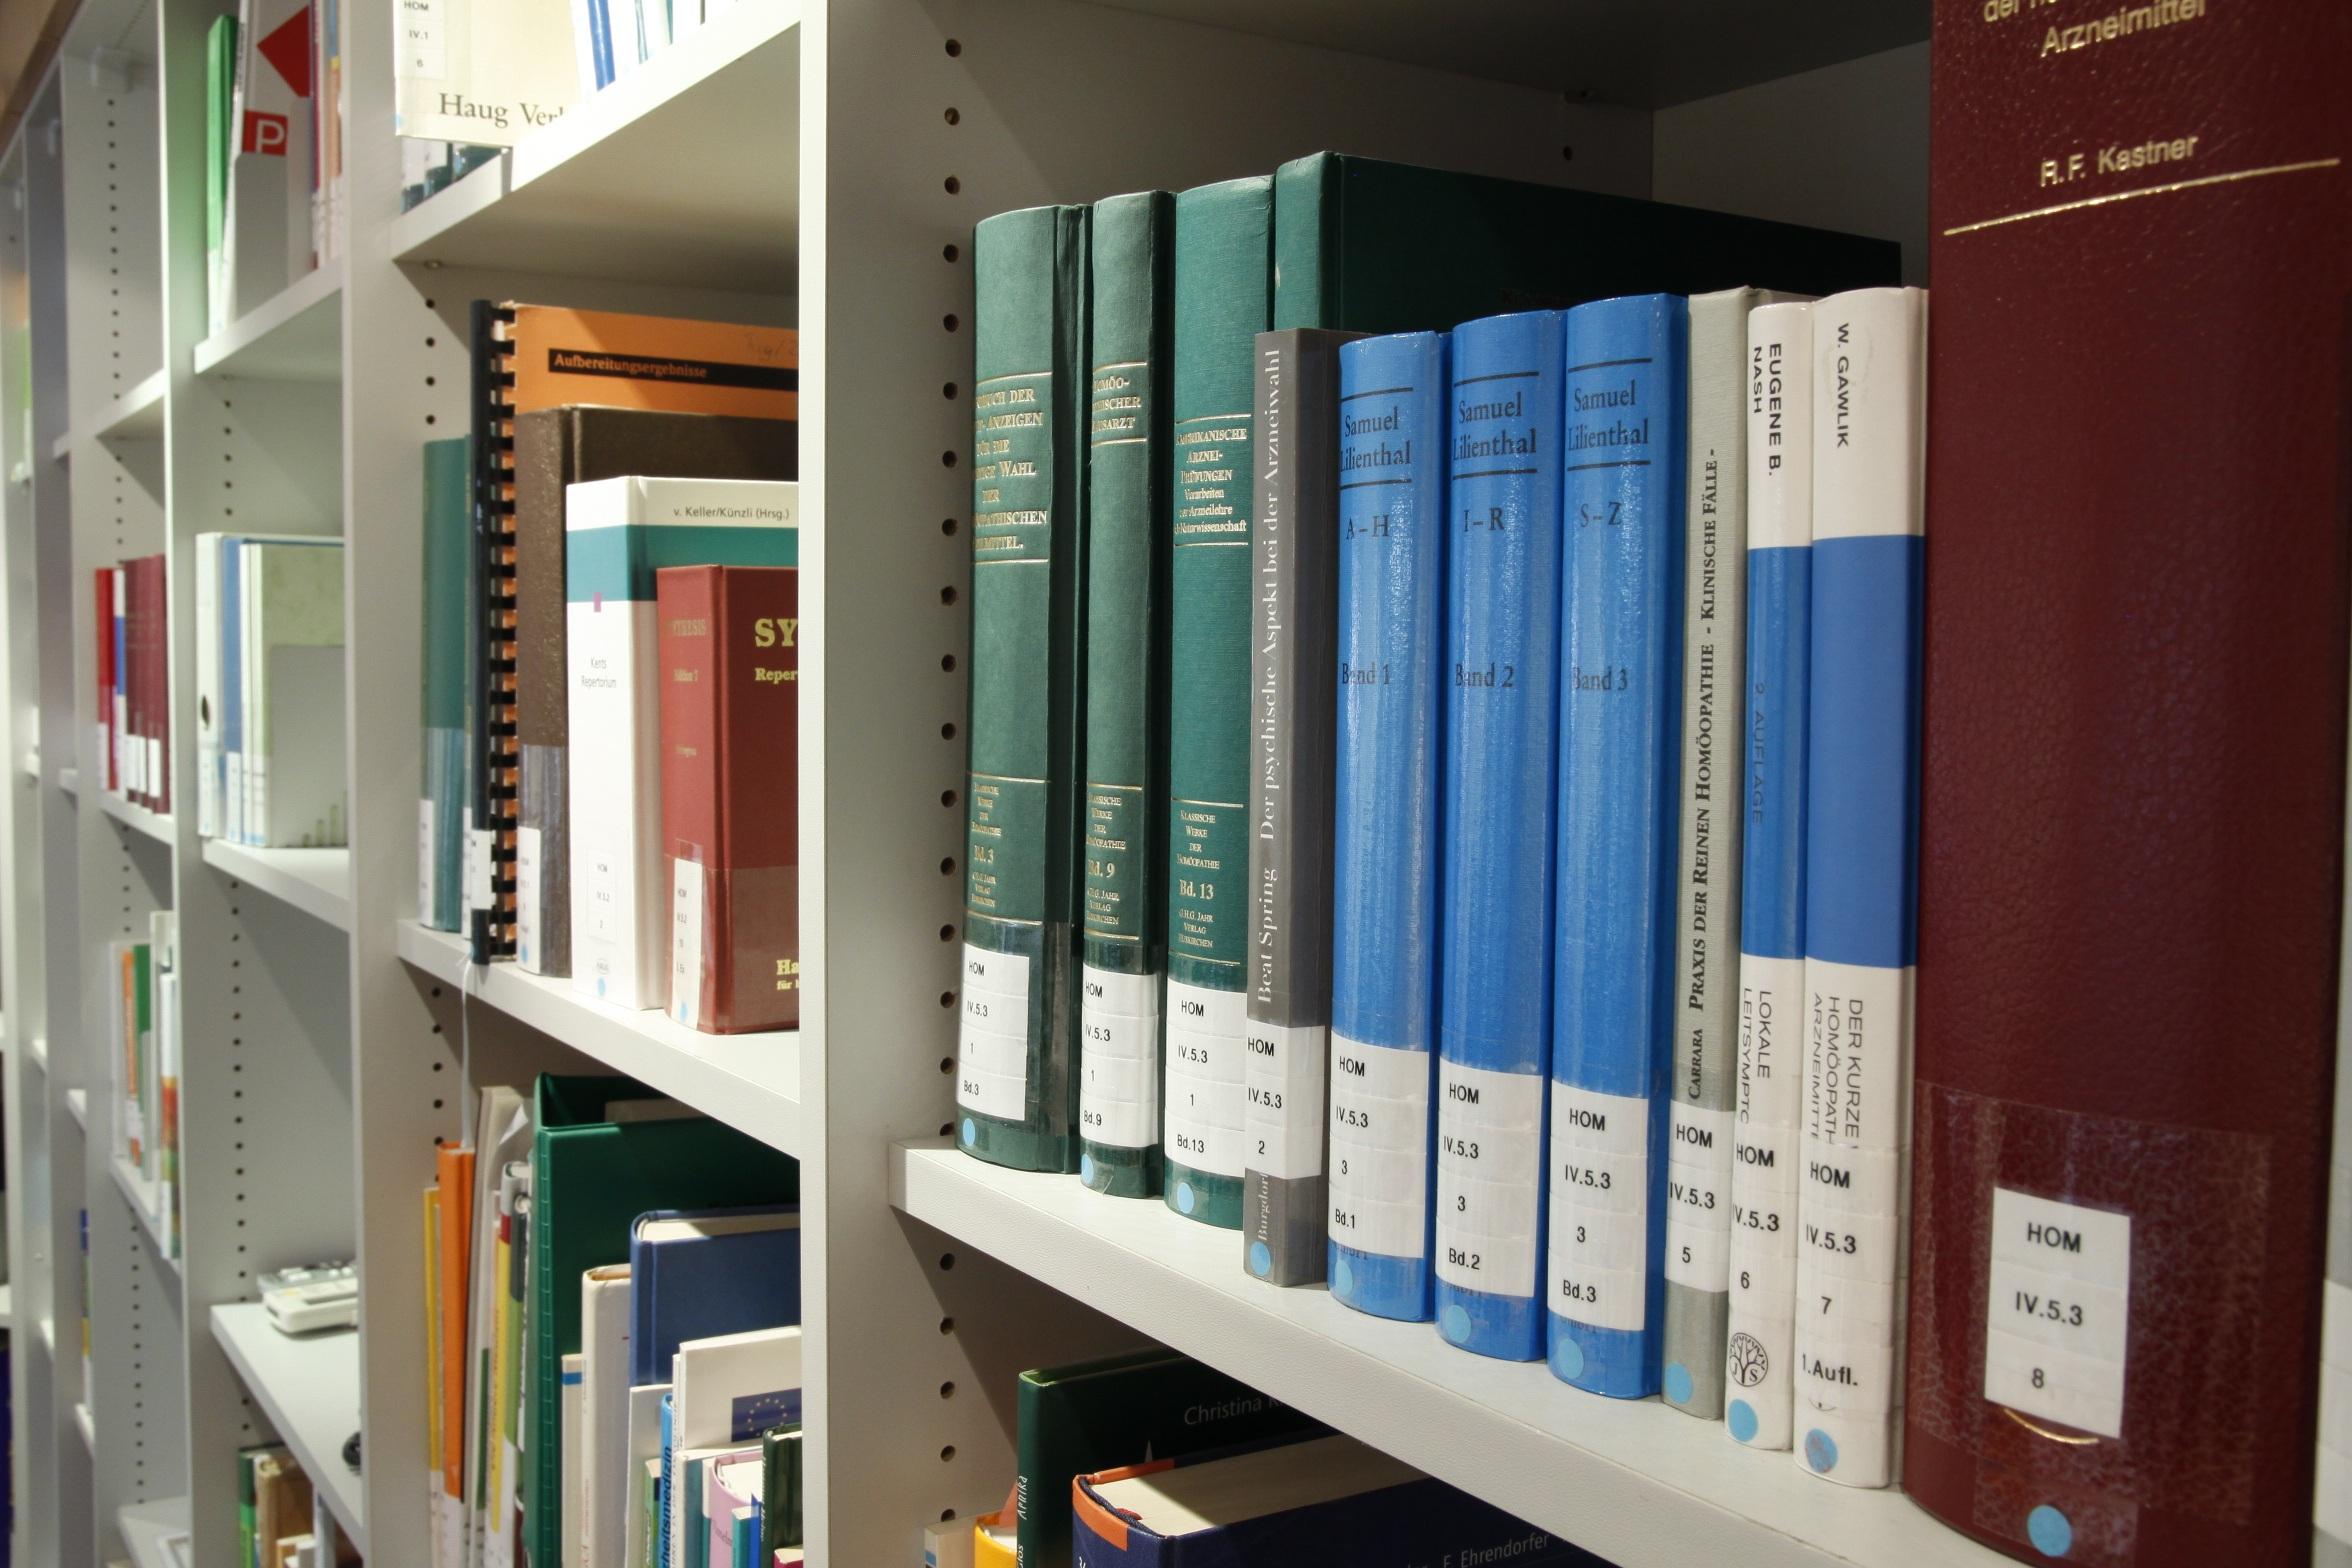 Book Read Shelf Furniture Room Bookshelf Education Interior Design Science Study Library Books Thinker University